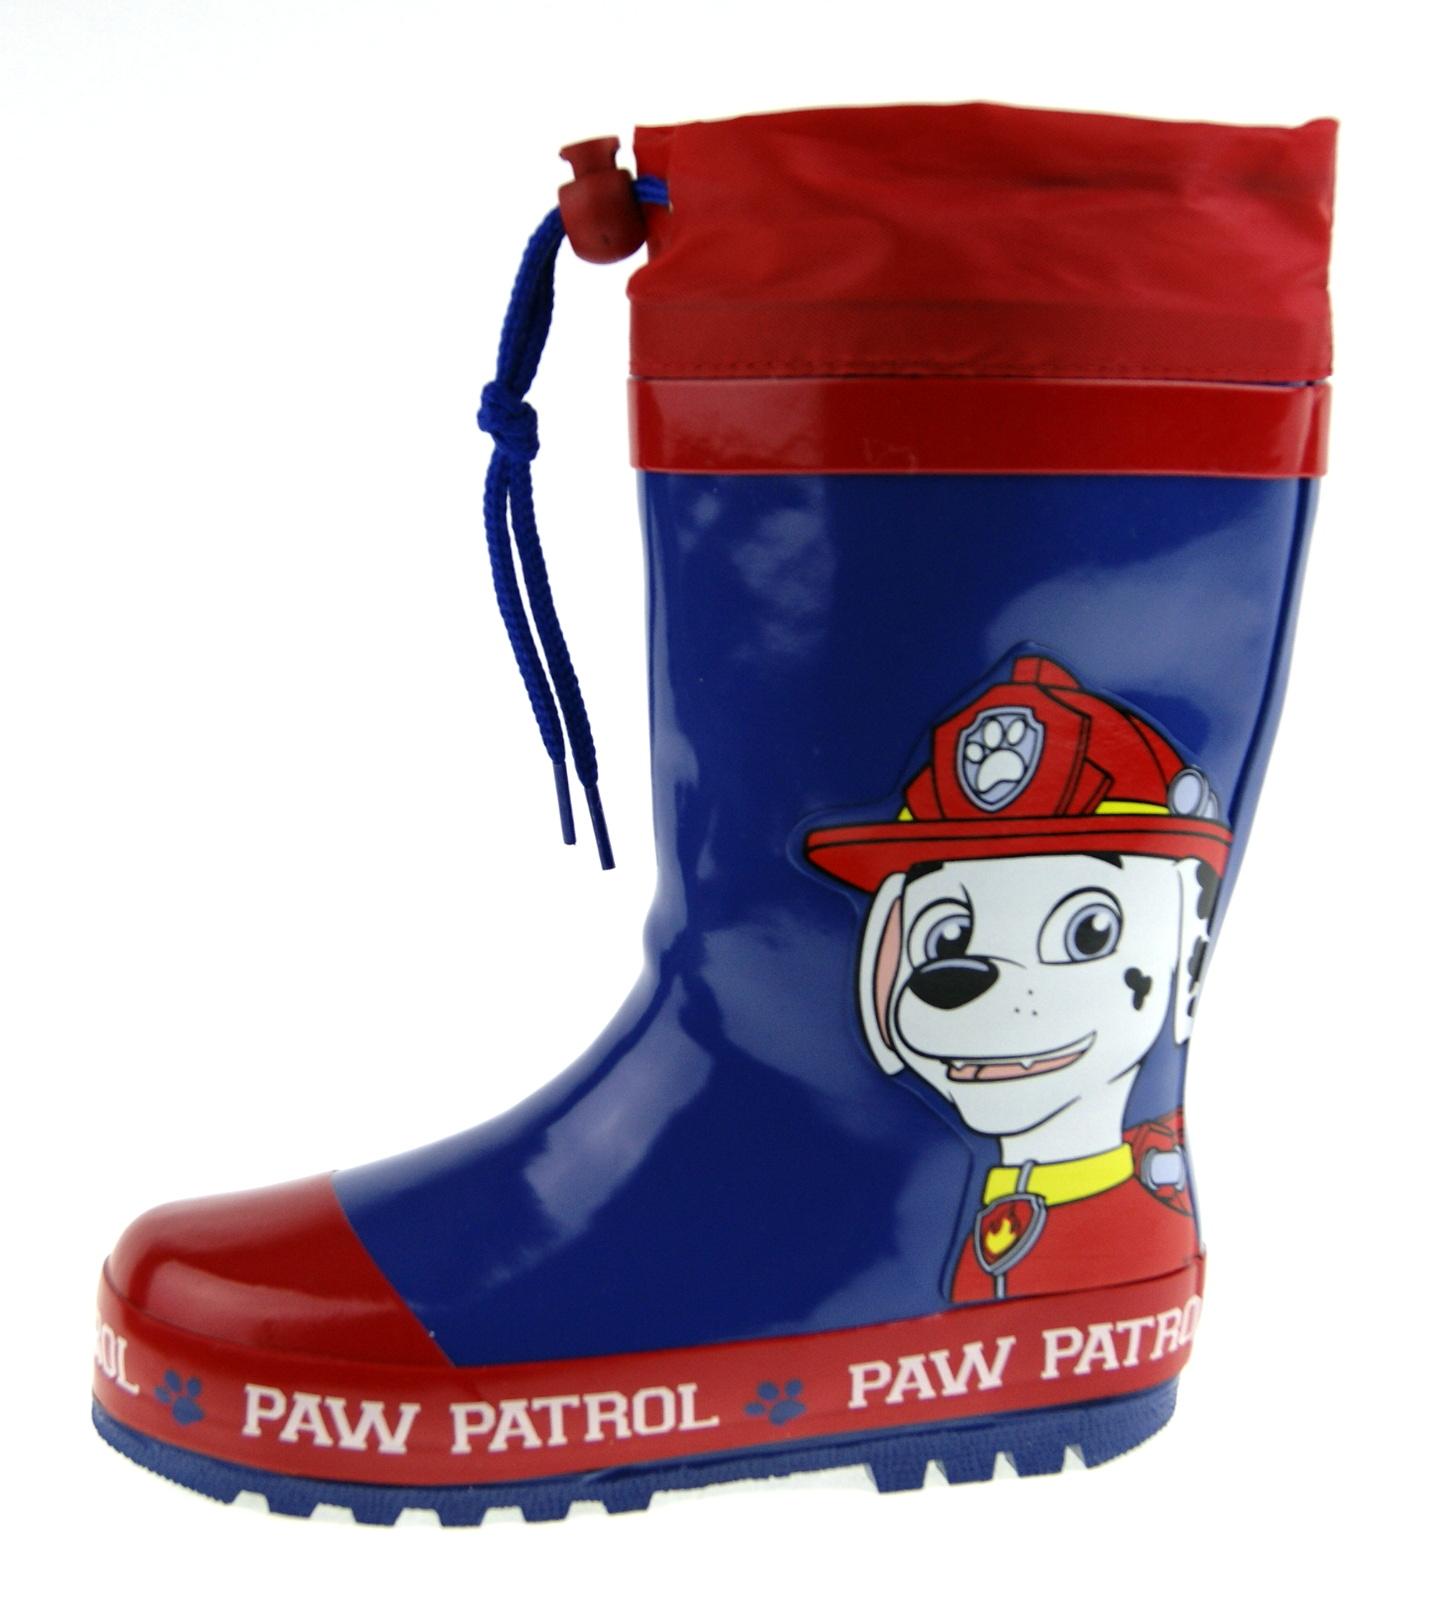 Paw Patrol Wellington Boots Tie Top